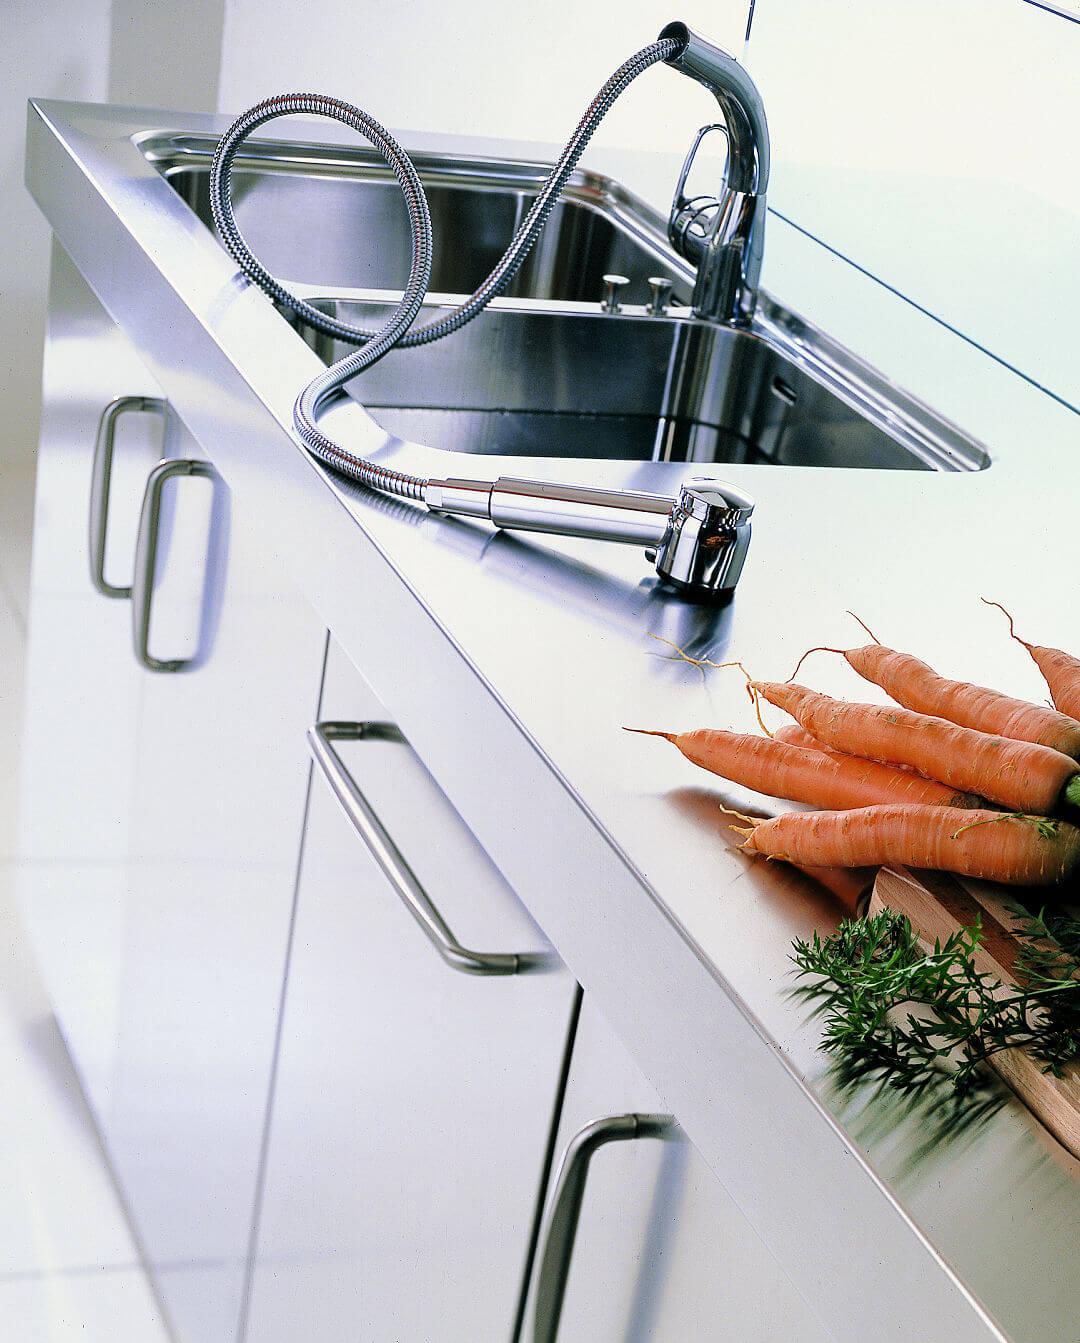 Arca Cucine Italy - Home Kitchen Stainless Steel - Spring - Sink